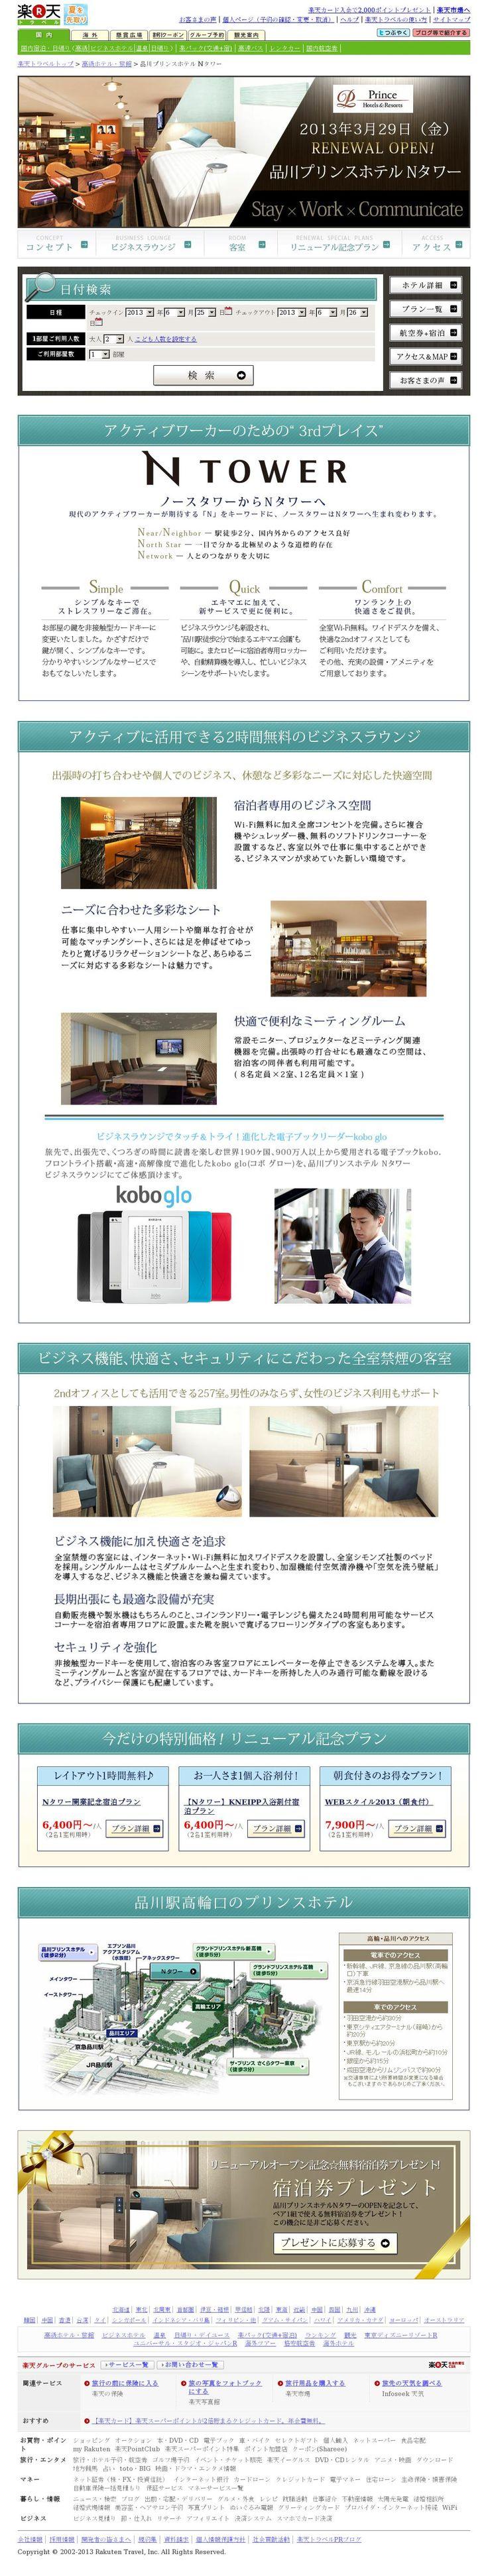 【D】【1社ブランディング】品川プリンスホテル Nタワー<2013/02/28>